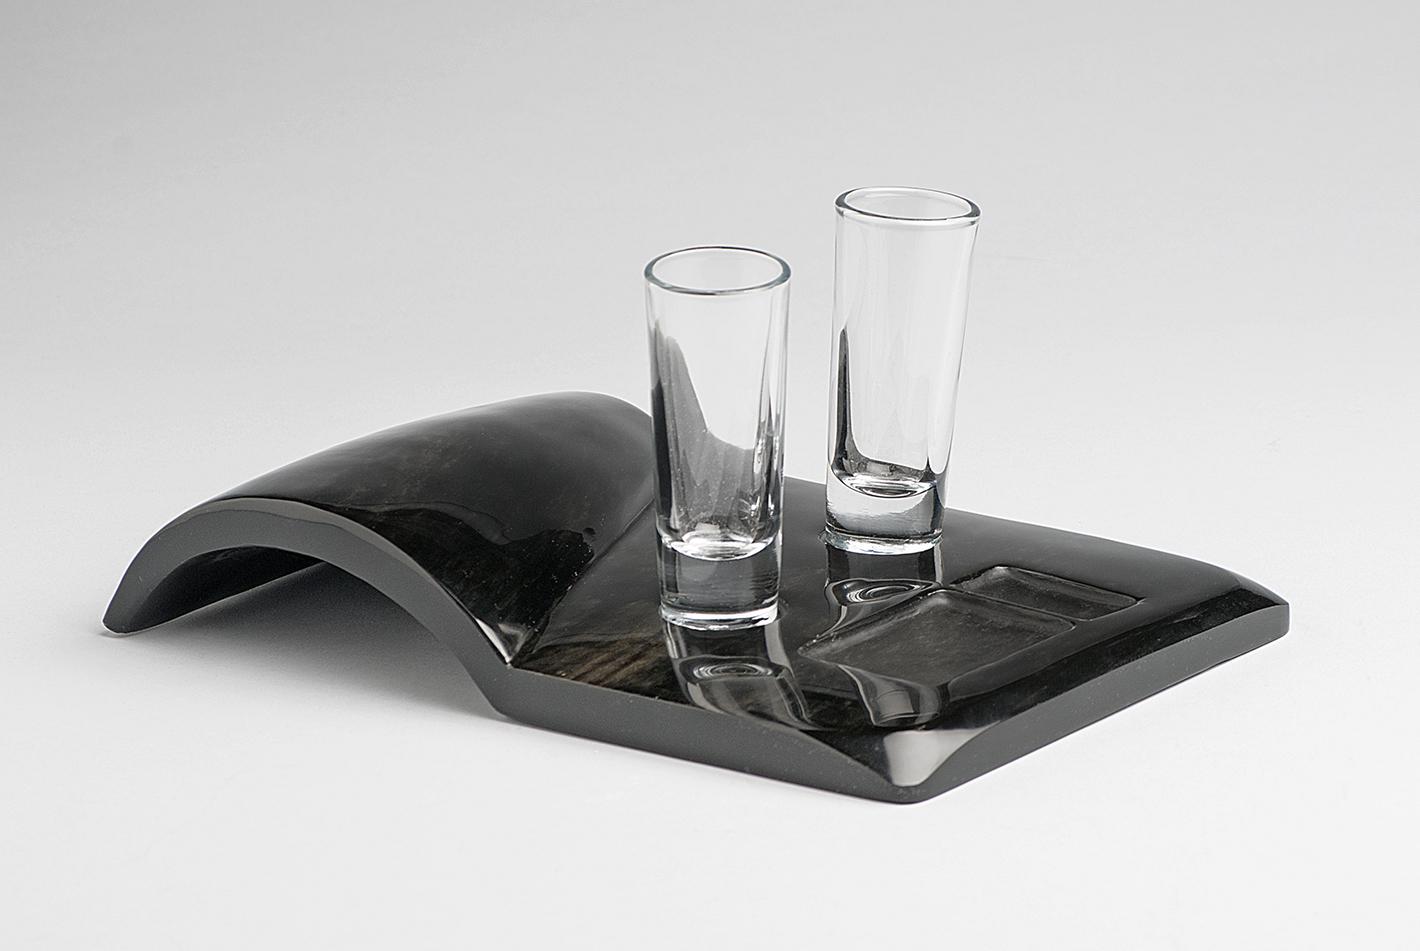 web2-Obsidian-Anahuac_DSC0122a-Mexico-Design-Timep-Marion-Friedmann.jpg